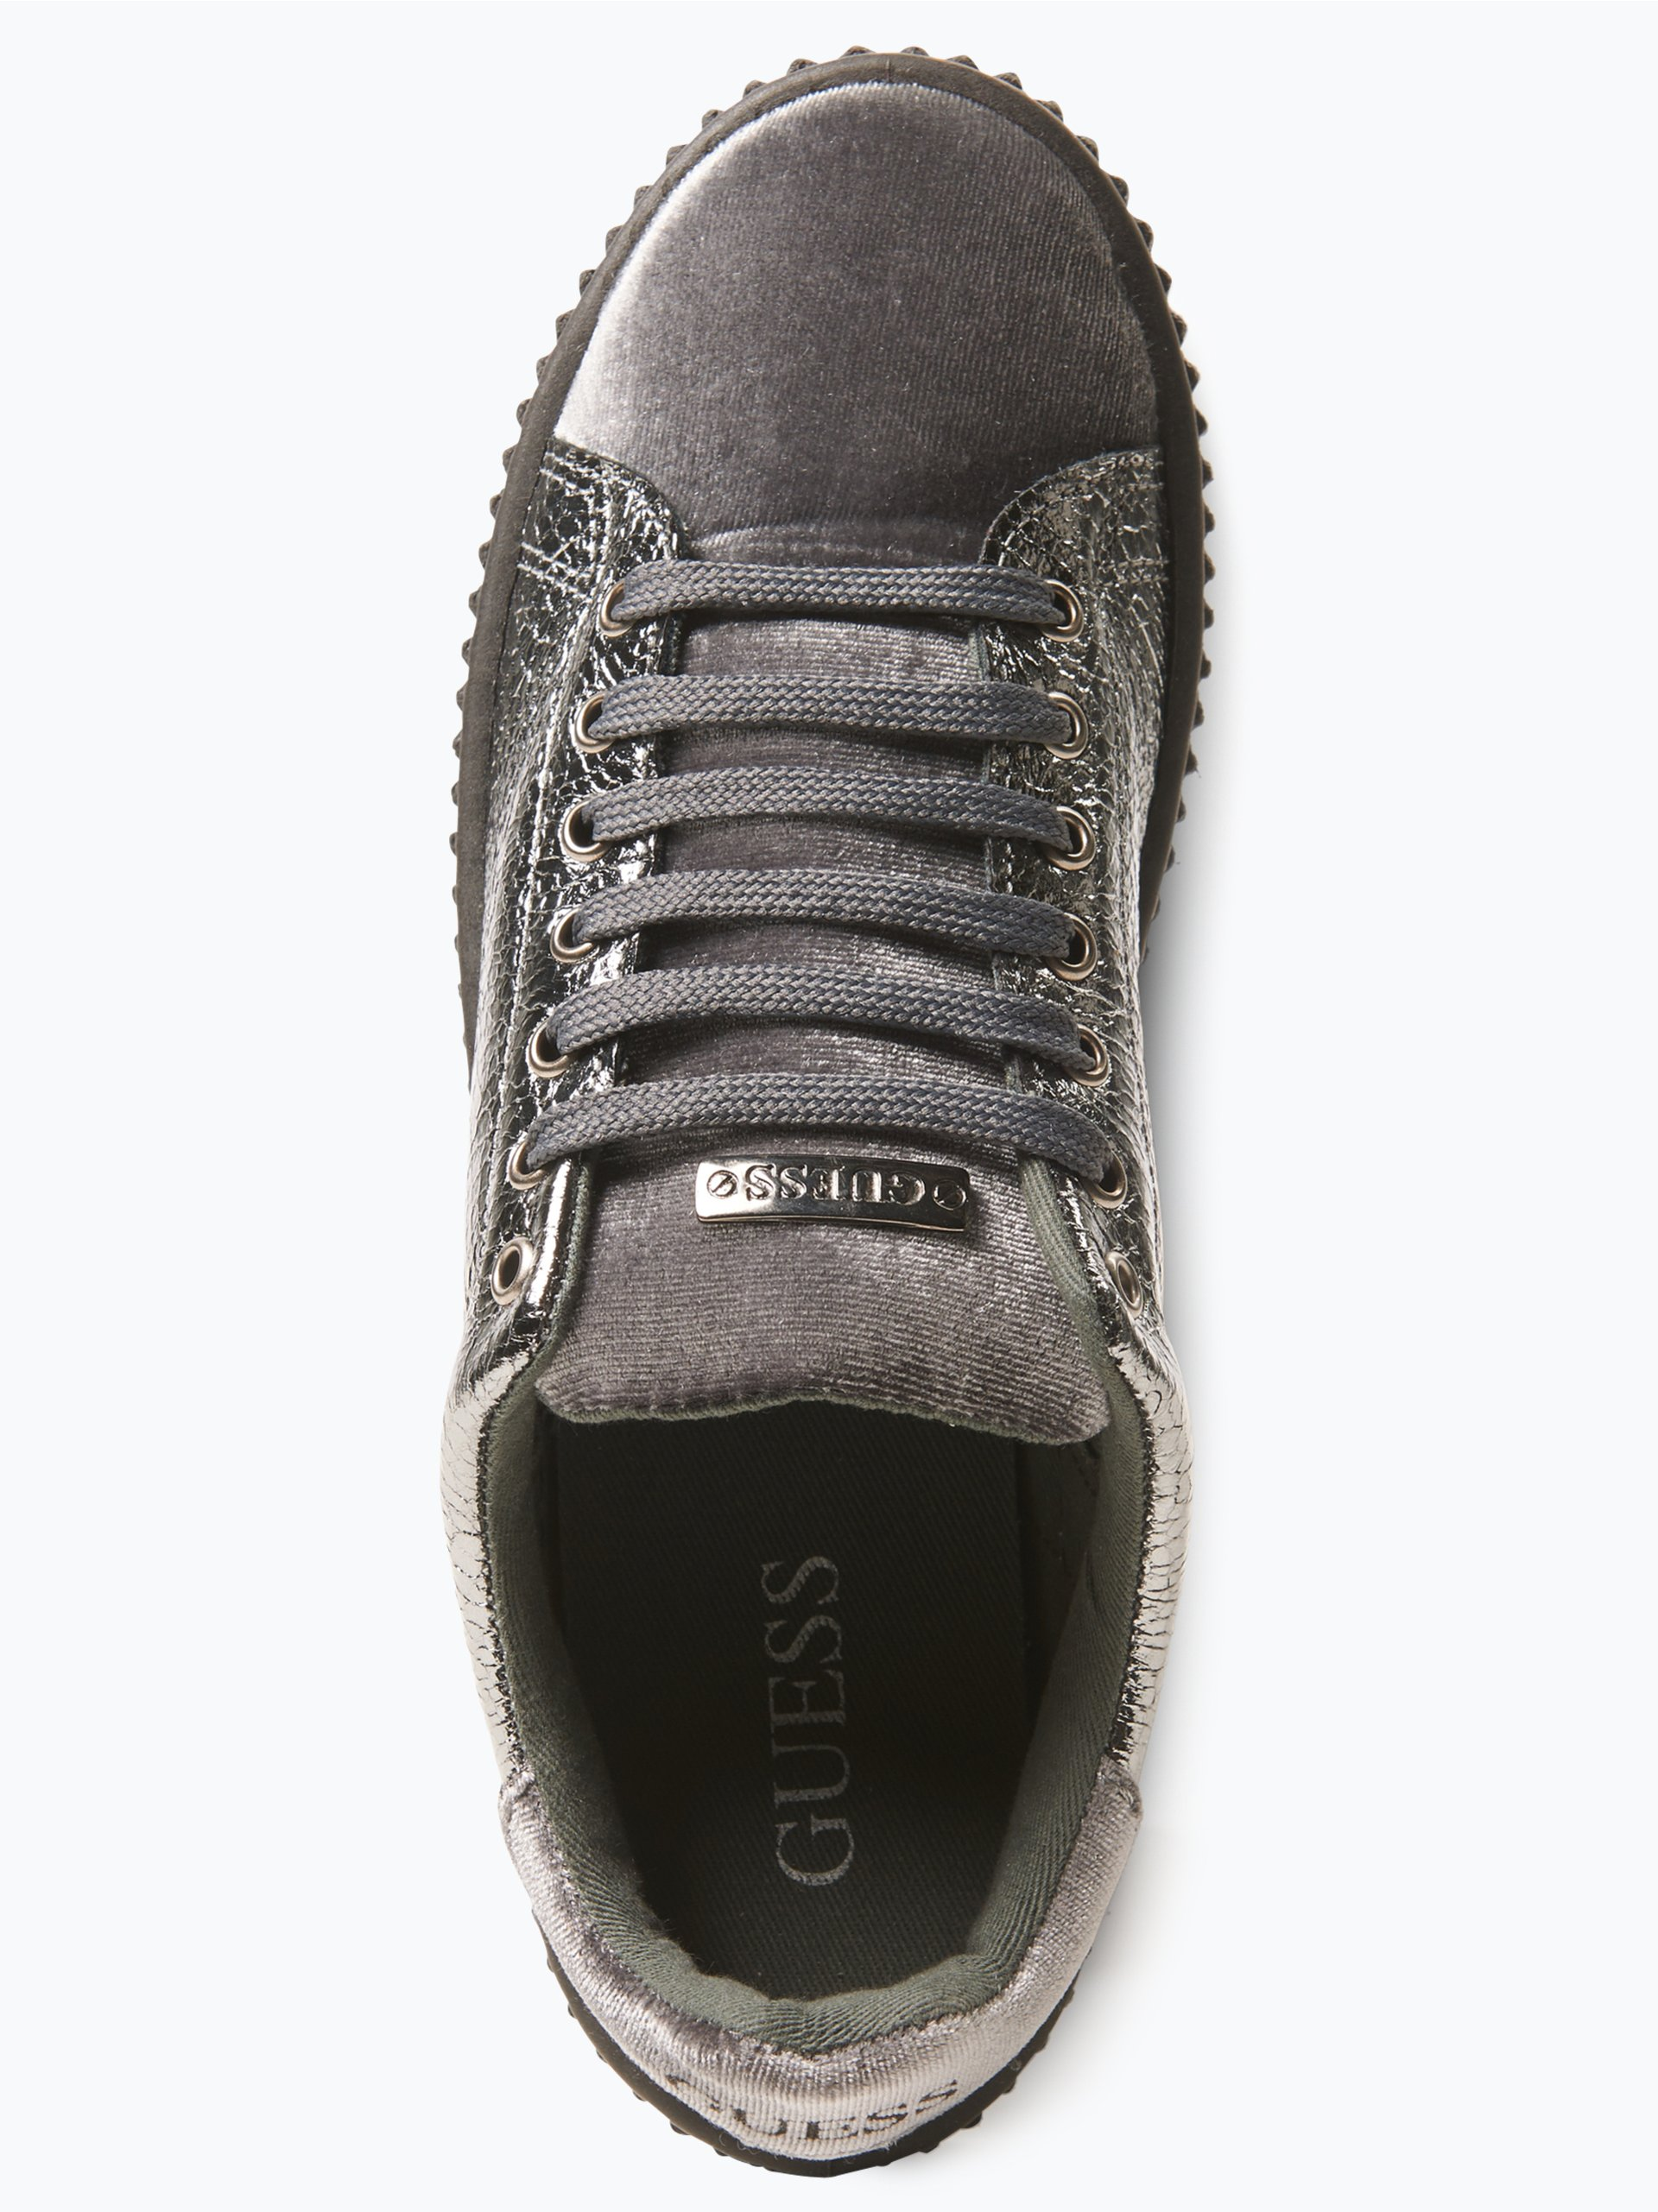 guess jeans damen sneaker grau uni online kaufen vangraaf com. Black Bedroom Furniture Sets. Home Design Ideas